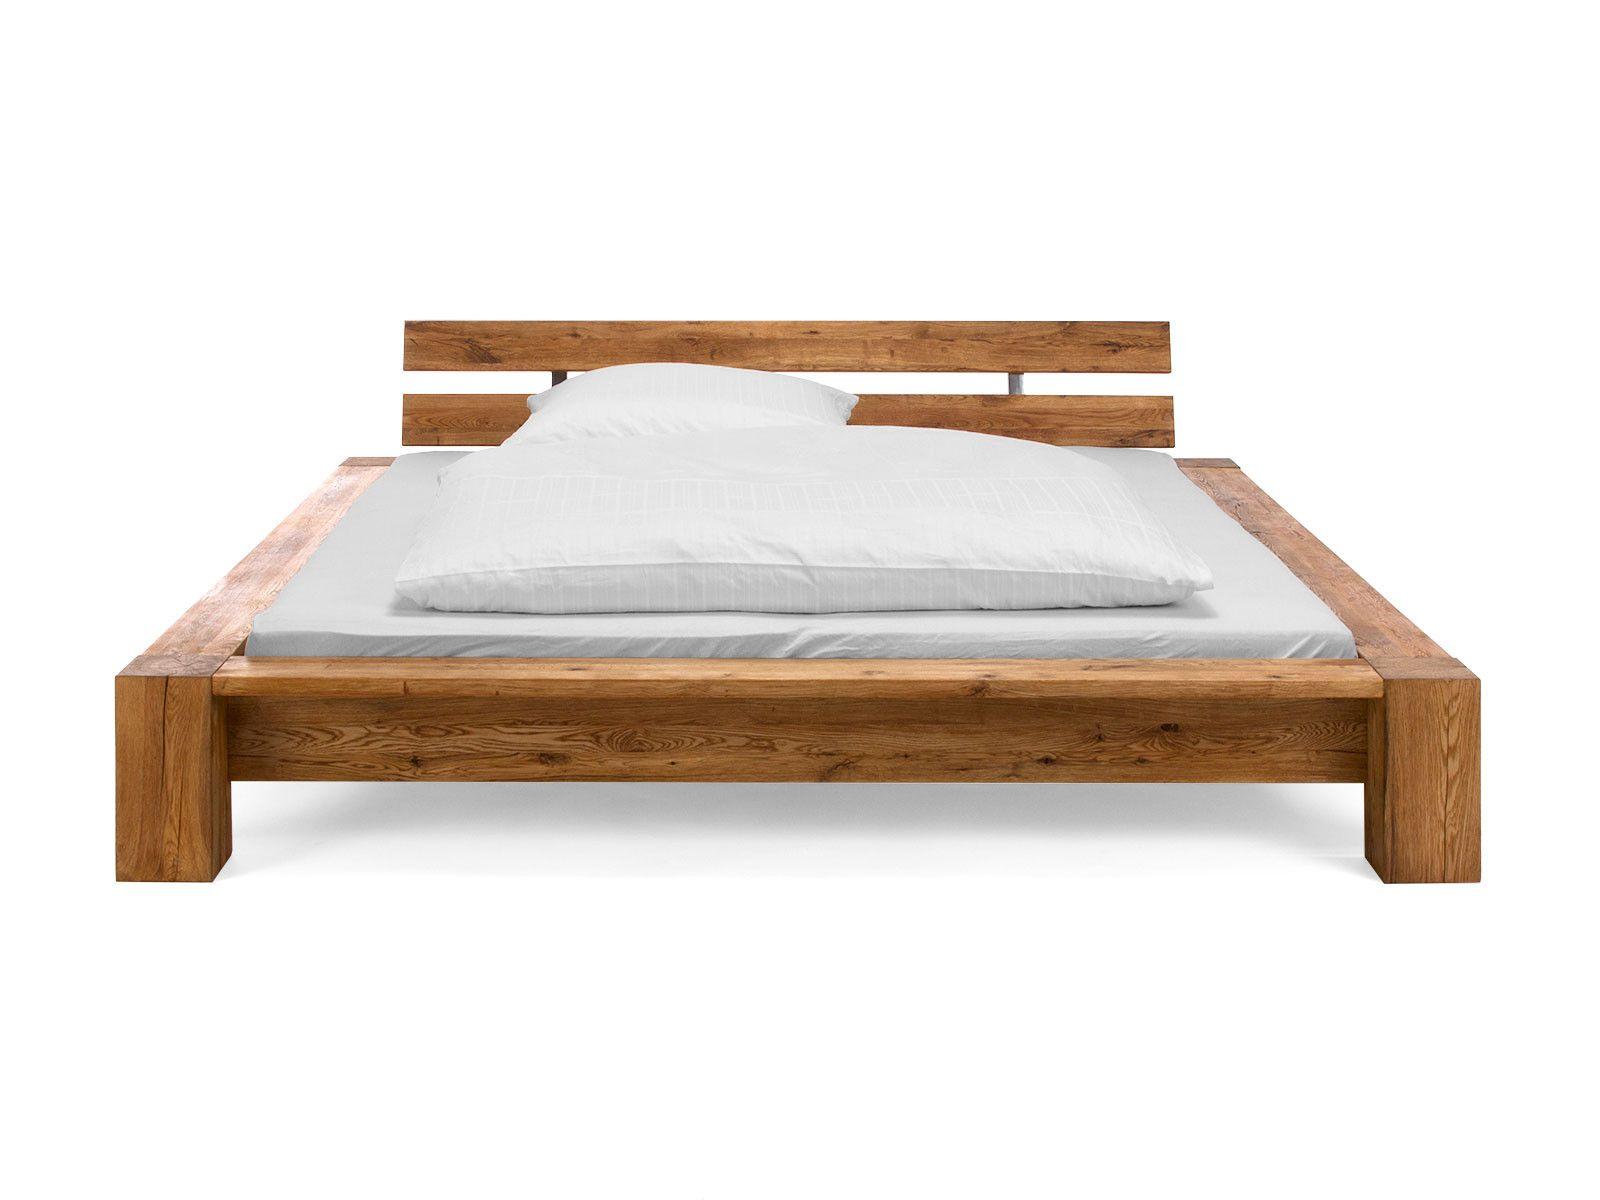 Genial 140x200 Bett